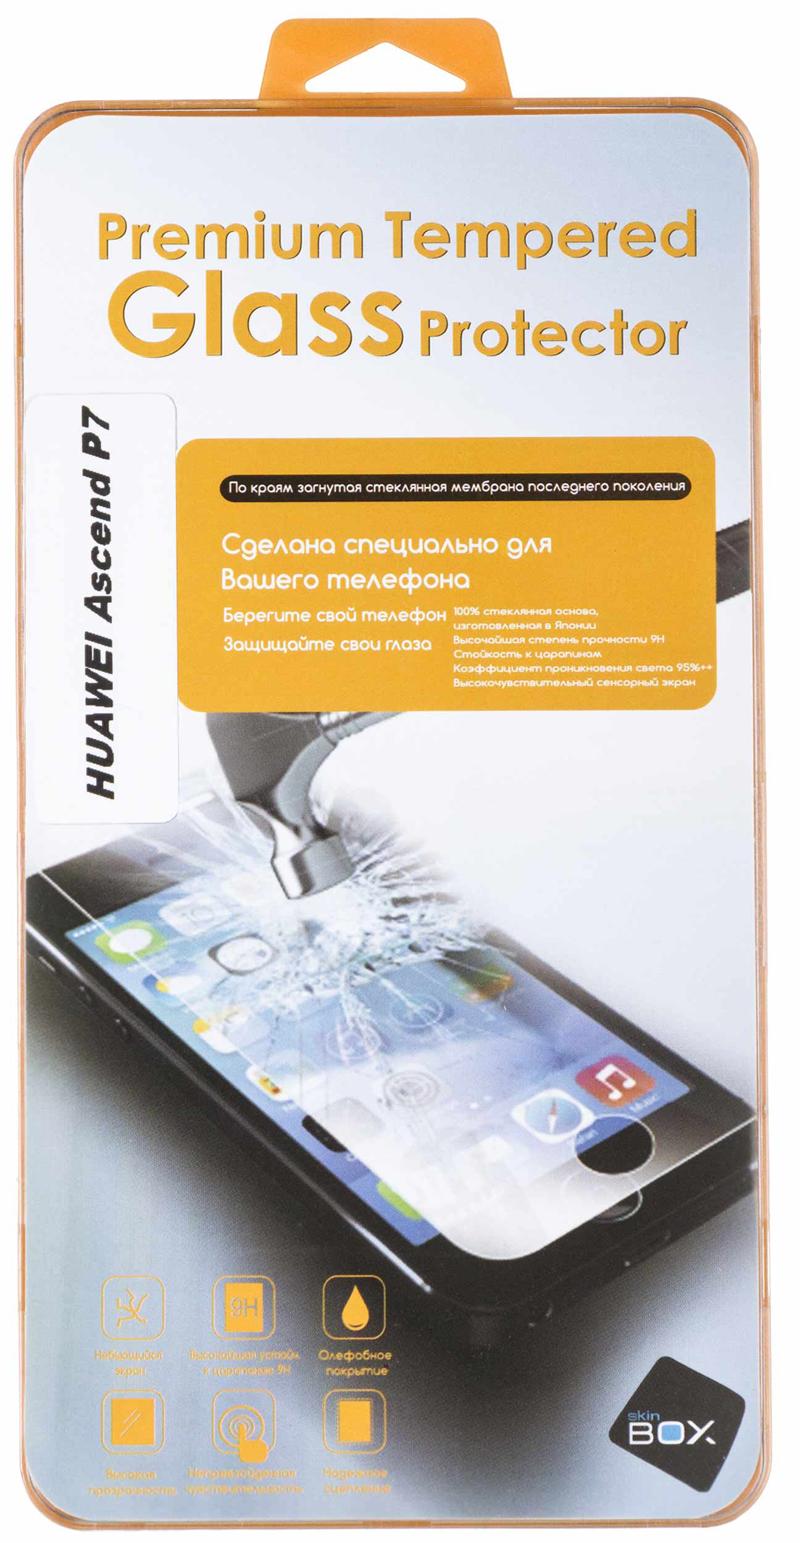 ������ �������� SkinBox ��� Huawei Ascend P7 ���������